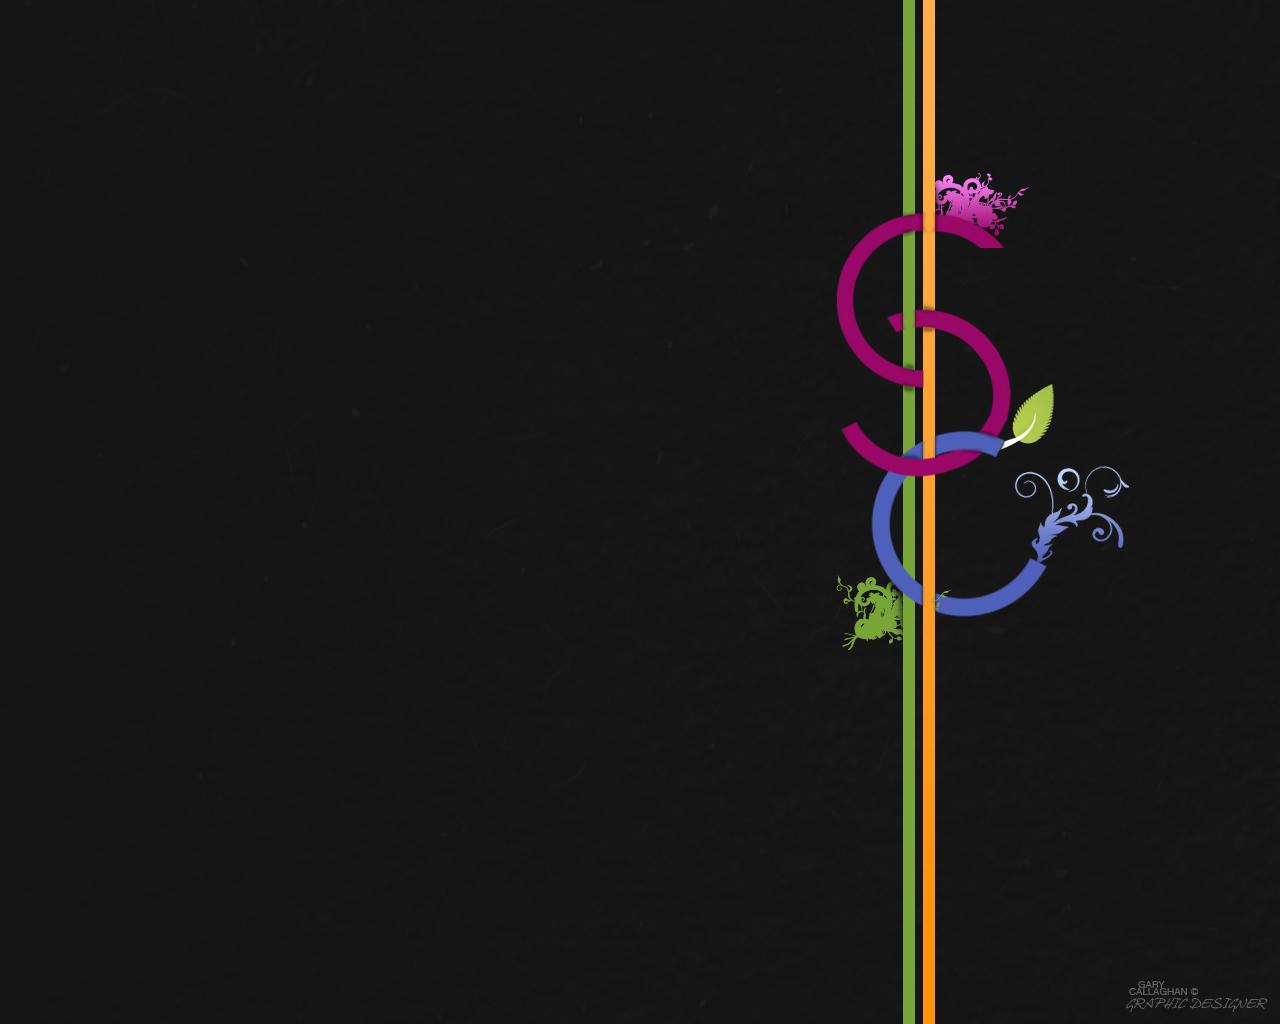 http://4.bp.blogspot.com/-PBY4QYy74uw/TfkHkb1wZgI/AAAAAAAAAO8/FKphbpyw4eA/s1600/Graphic_Designer_Wallpaper_by_C_GFX.jpg